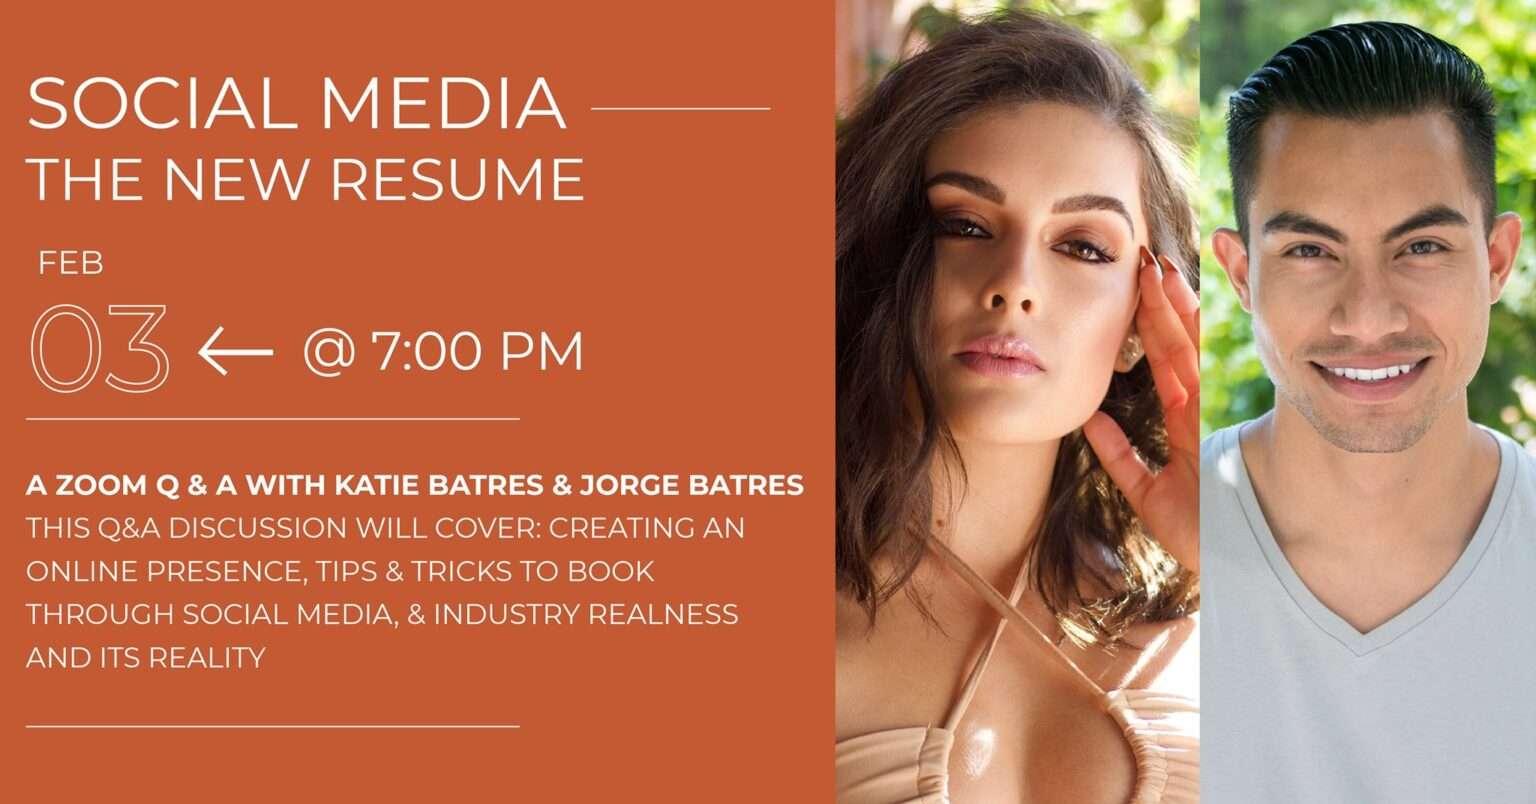 Social Media - The New Resume